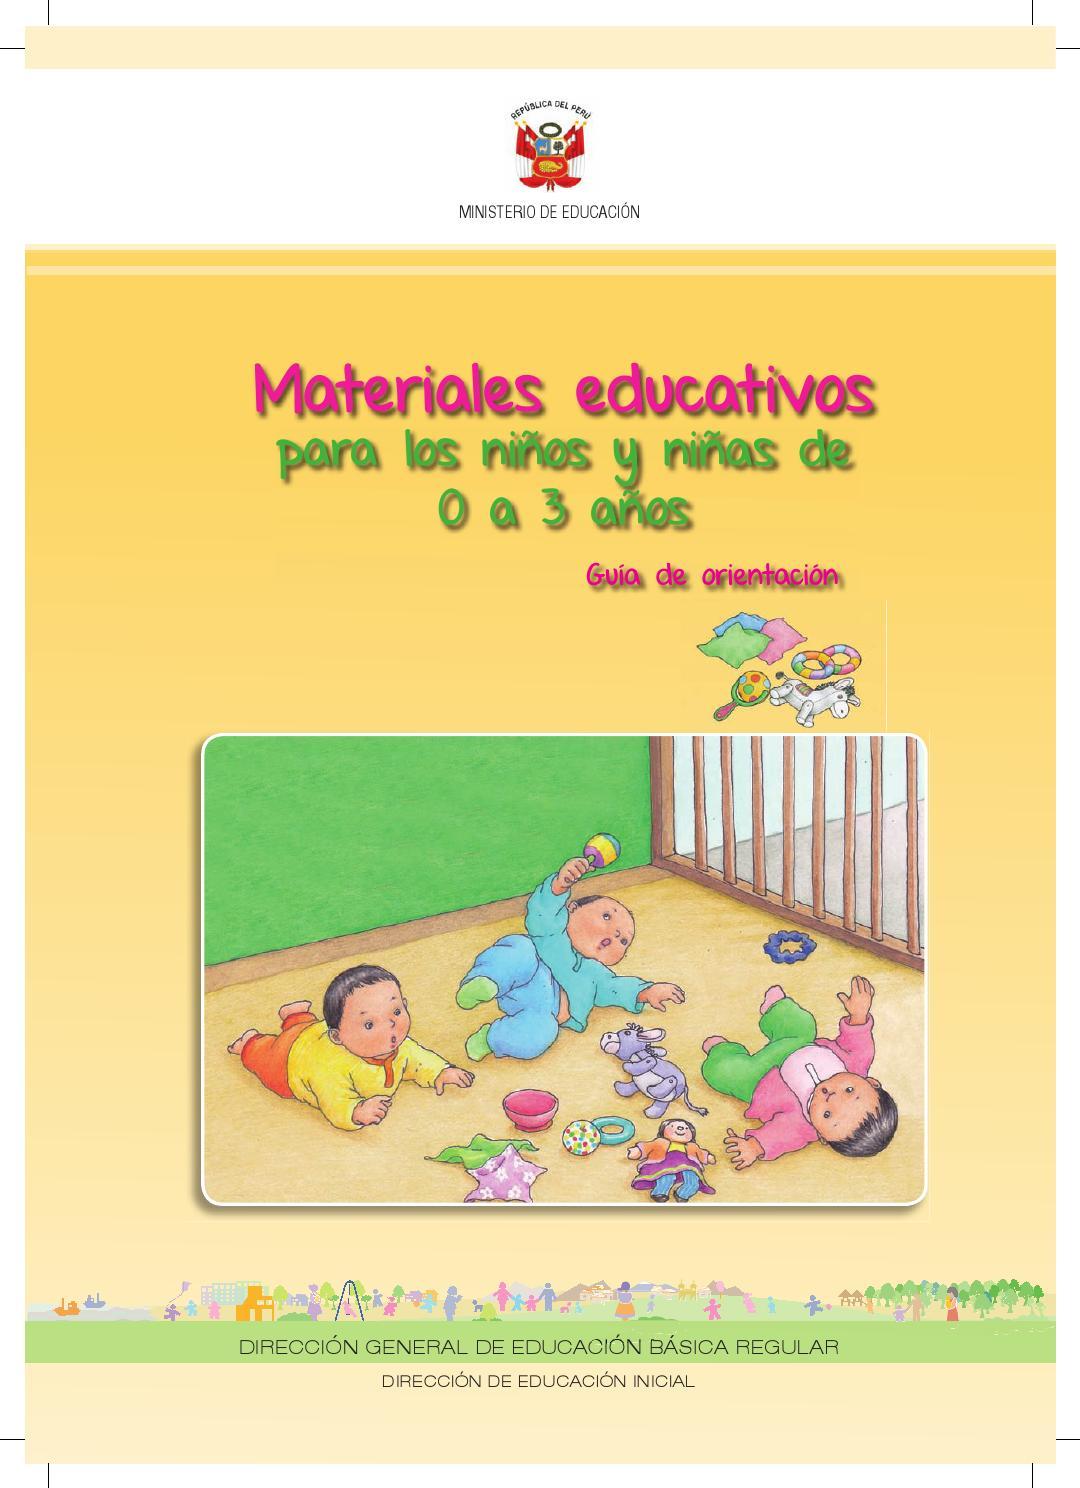 3 Educativos Pikler Kris Issuu Guia Años Loczy By 0 Materiales xtsrdCQh